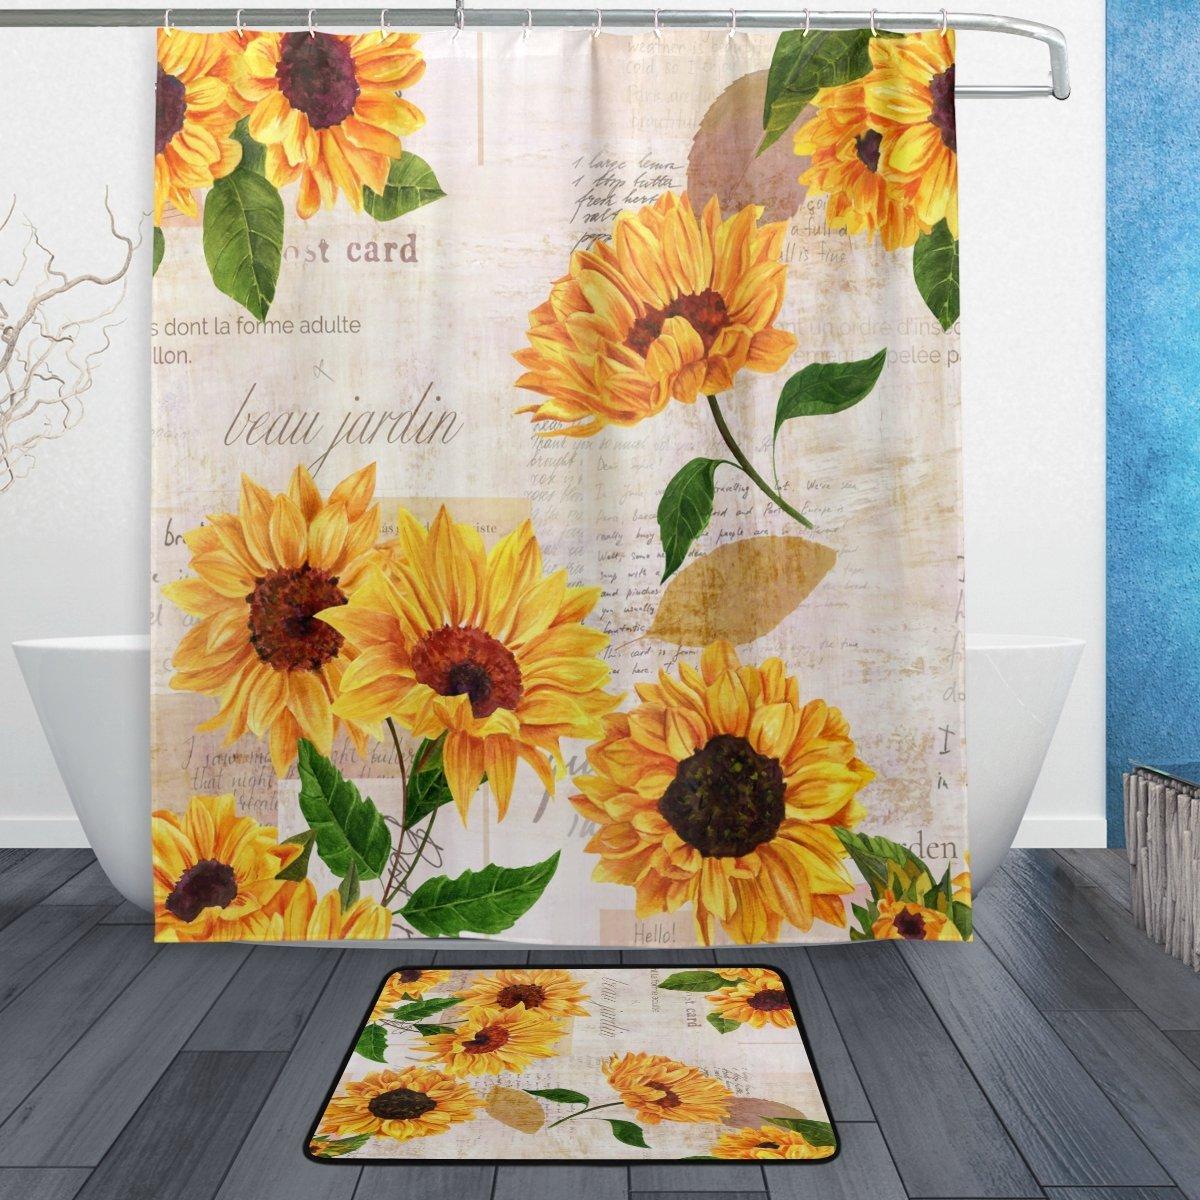 Summer Sunflower Shower Curtain And Mat Set Vintage Retro Floral Waterproof Fabric Bathroom